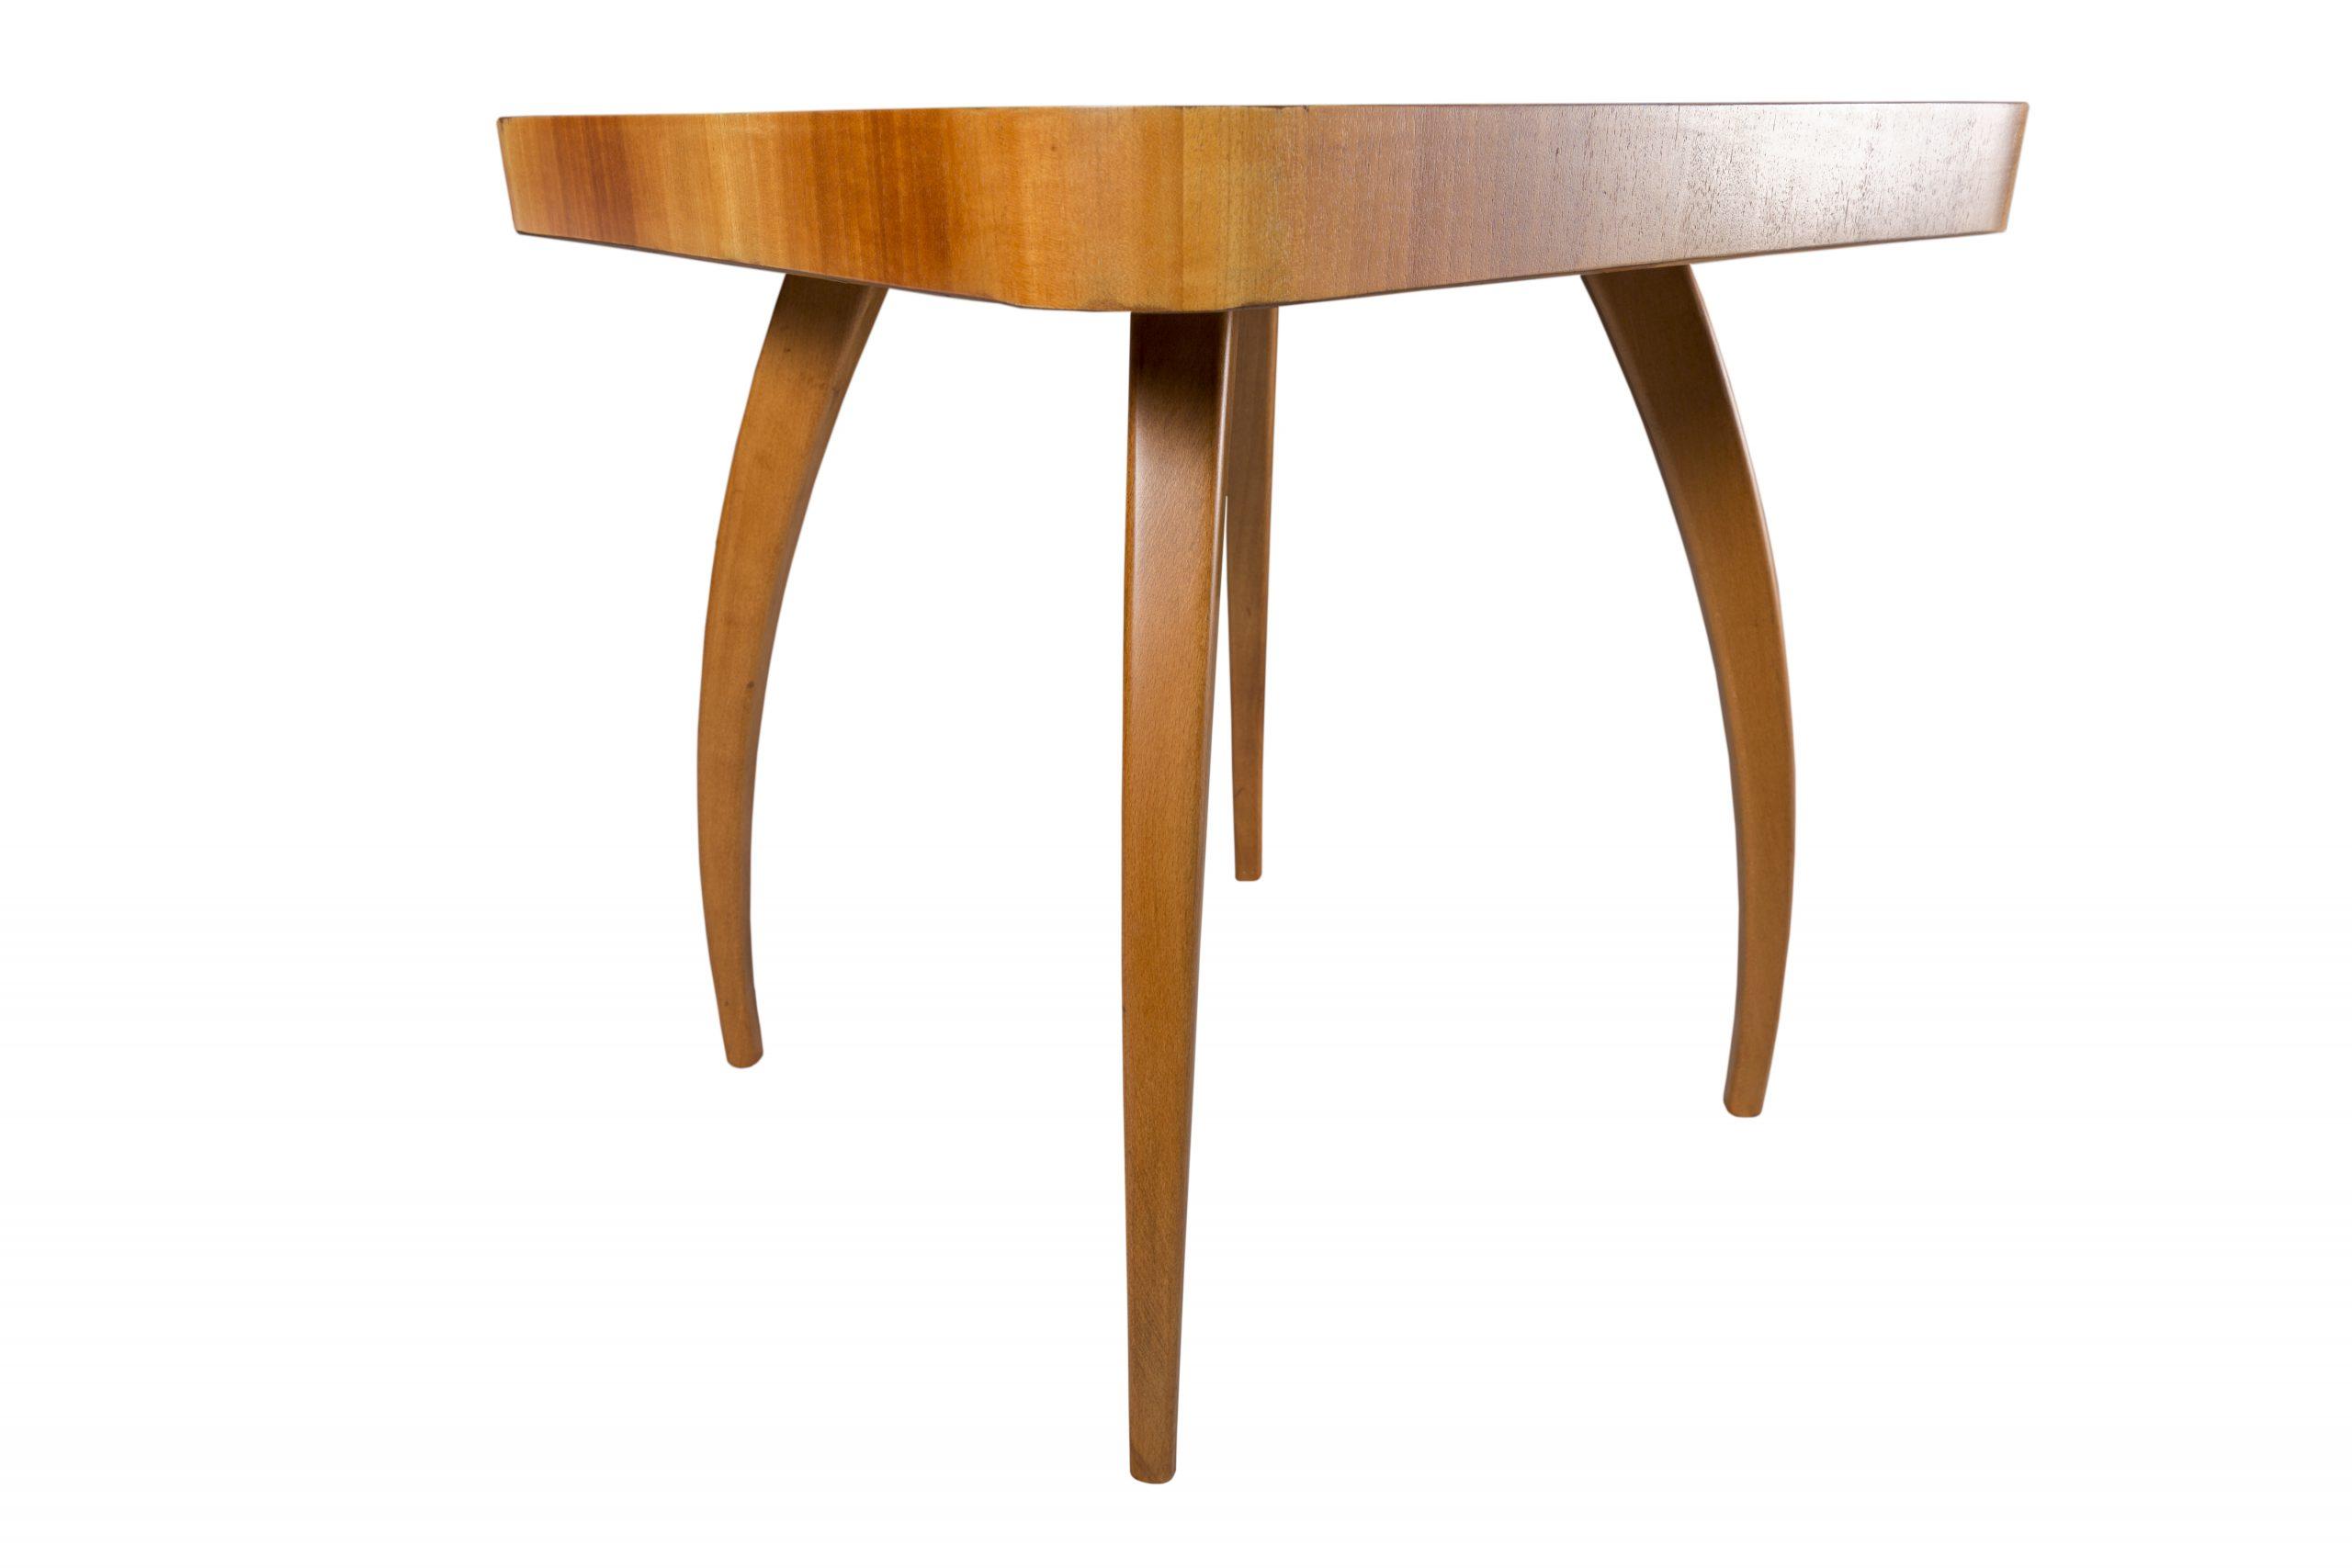 Spider Coffee Table by J.Halabala H259